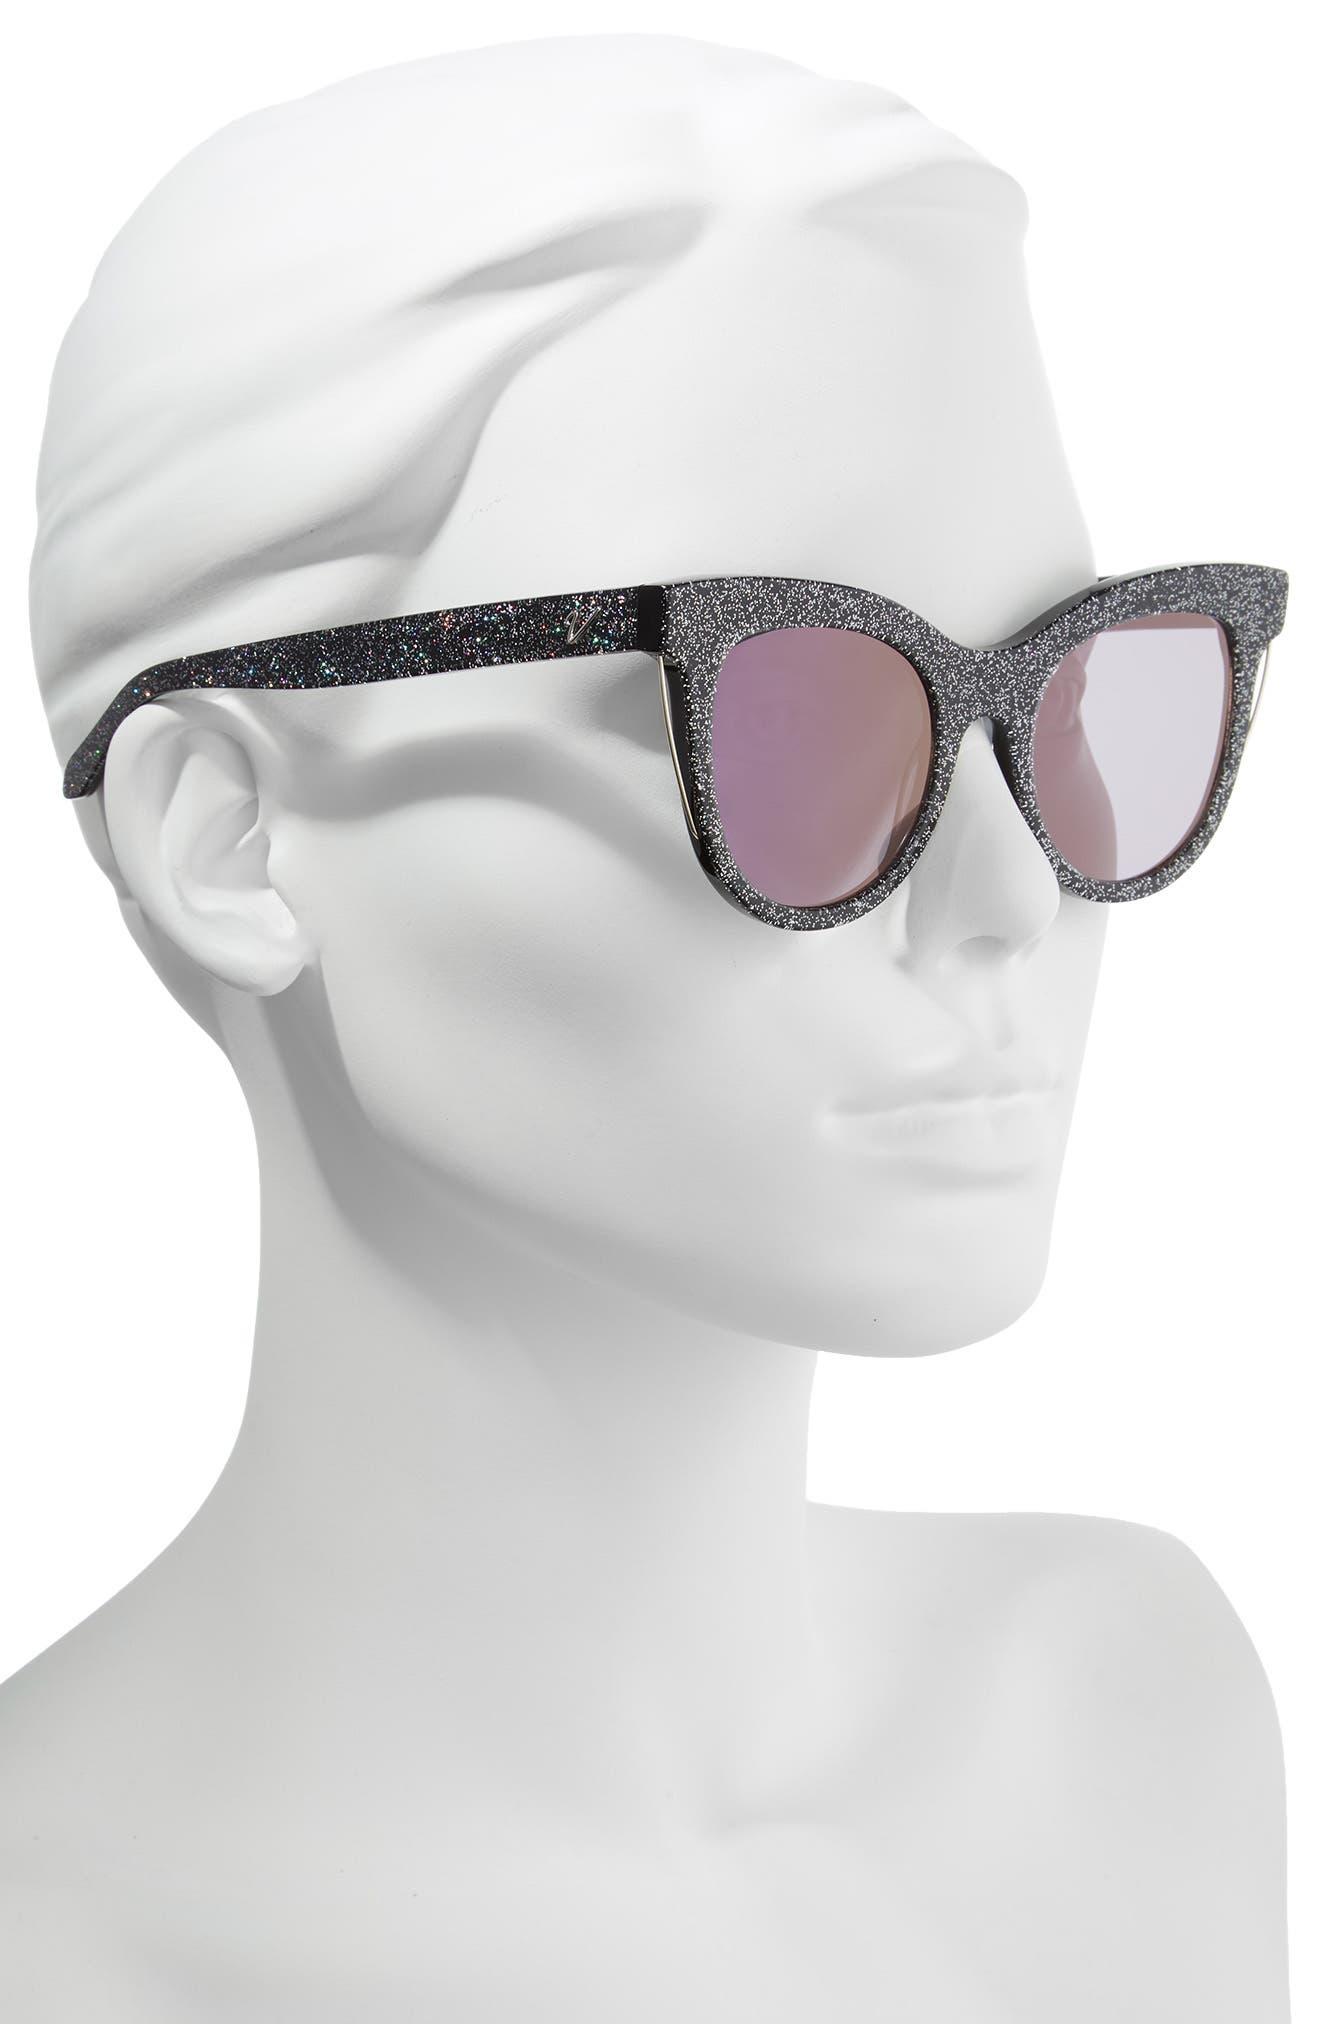 Sloane 52mm Cat Eye Sunglasses,                             Alternate thumbnail 2, color,                             MULTI GLITTER/ PURPLE FLASH